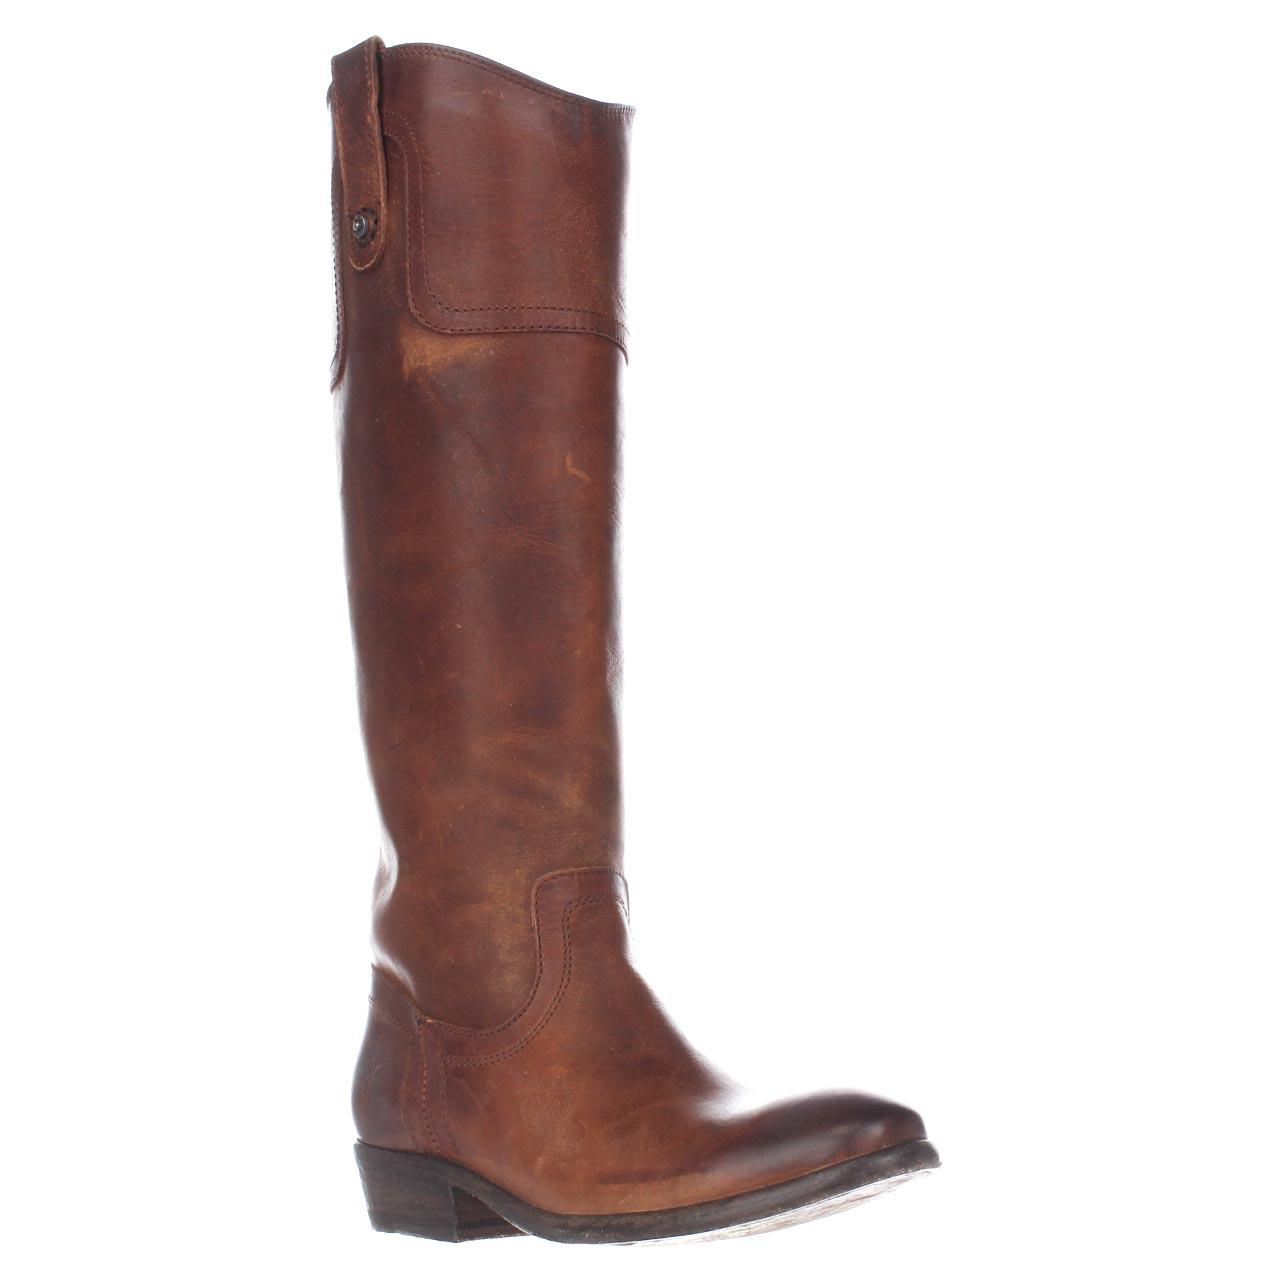 Womens FRYE Carson Riding Button Western Tall Boots - Cognac